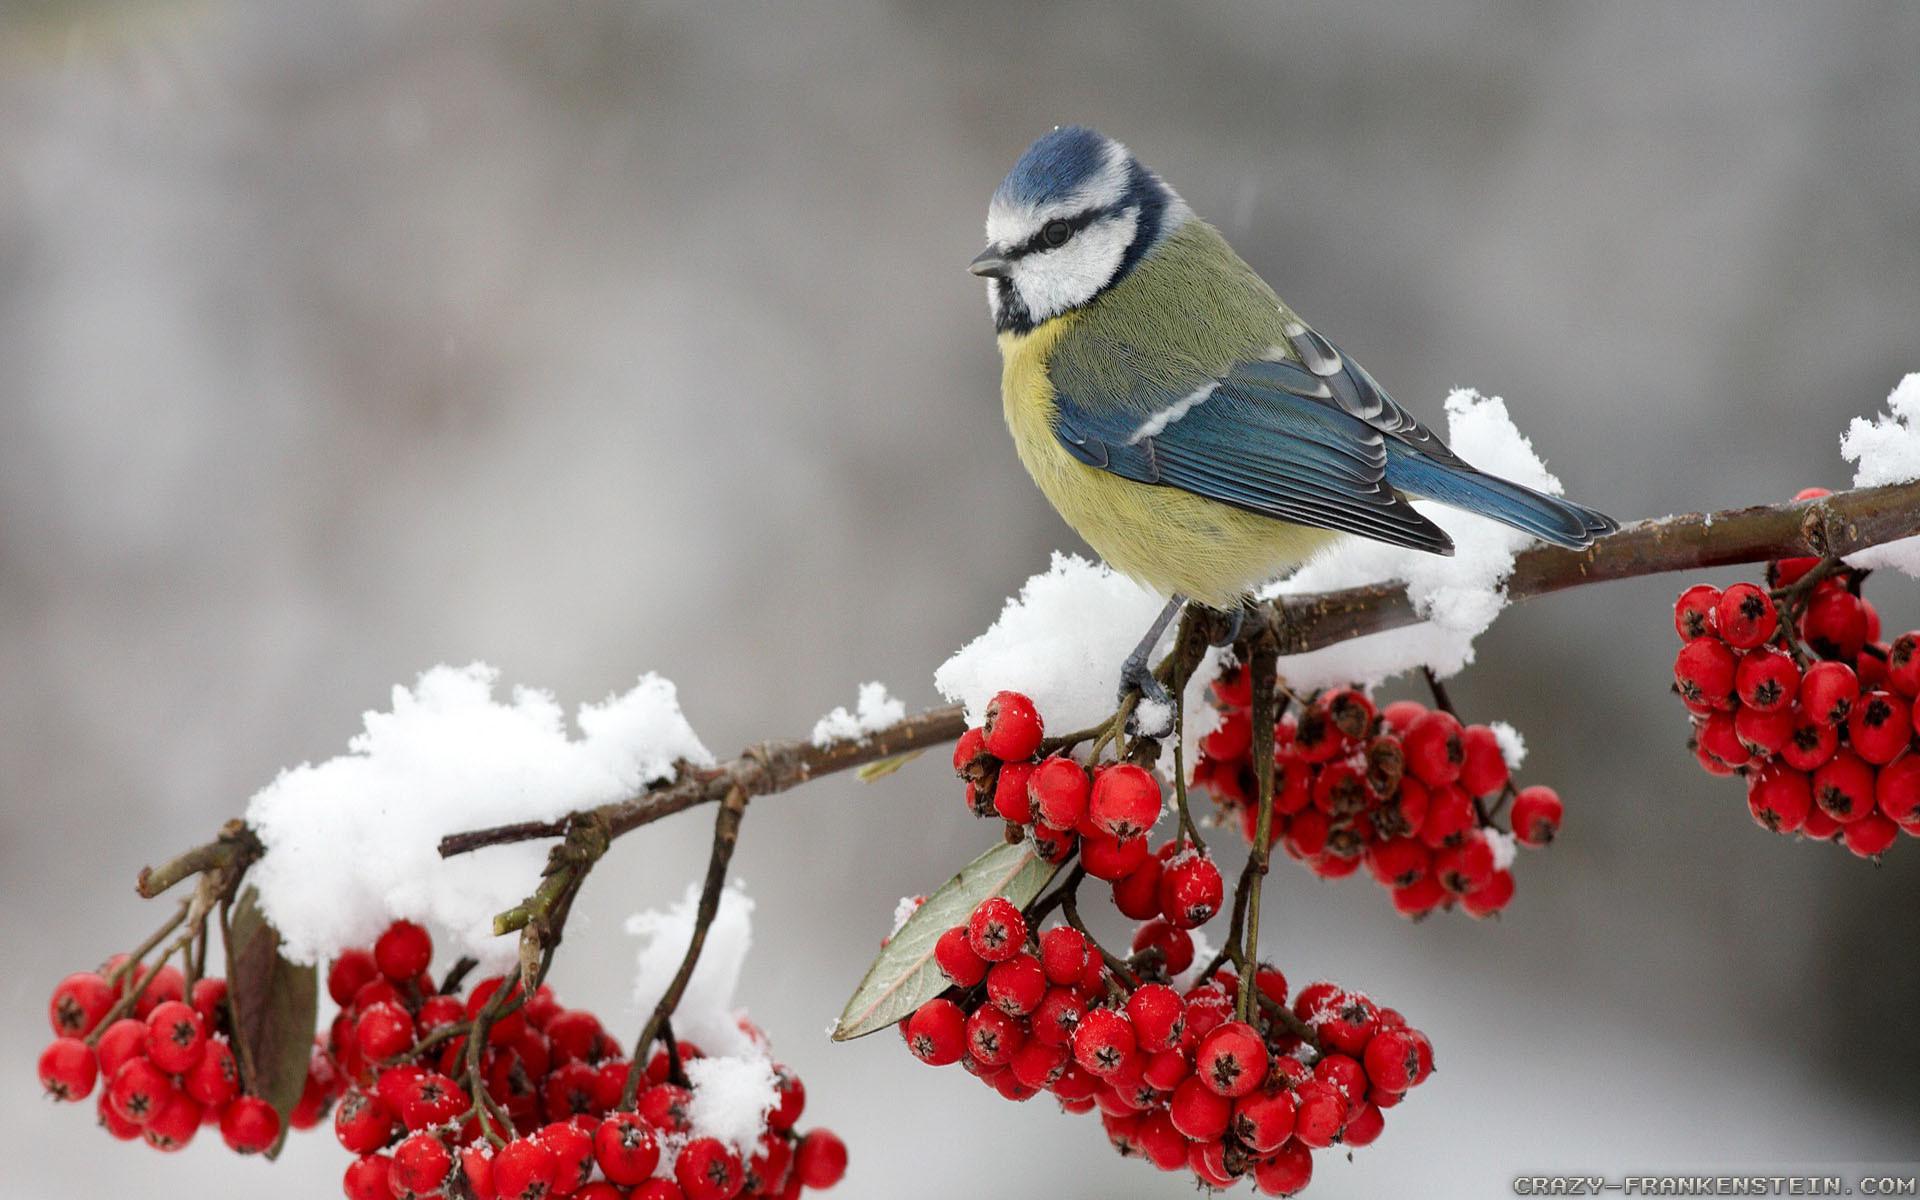 Res: 1920x1200, Computer Free Christmas Bird Wallpapers, Desktop Backgrounds